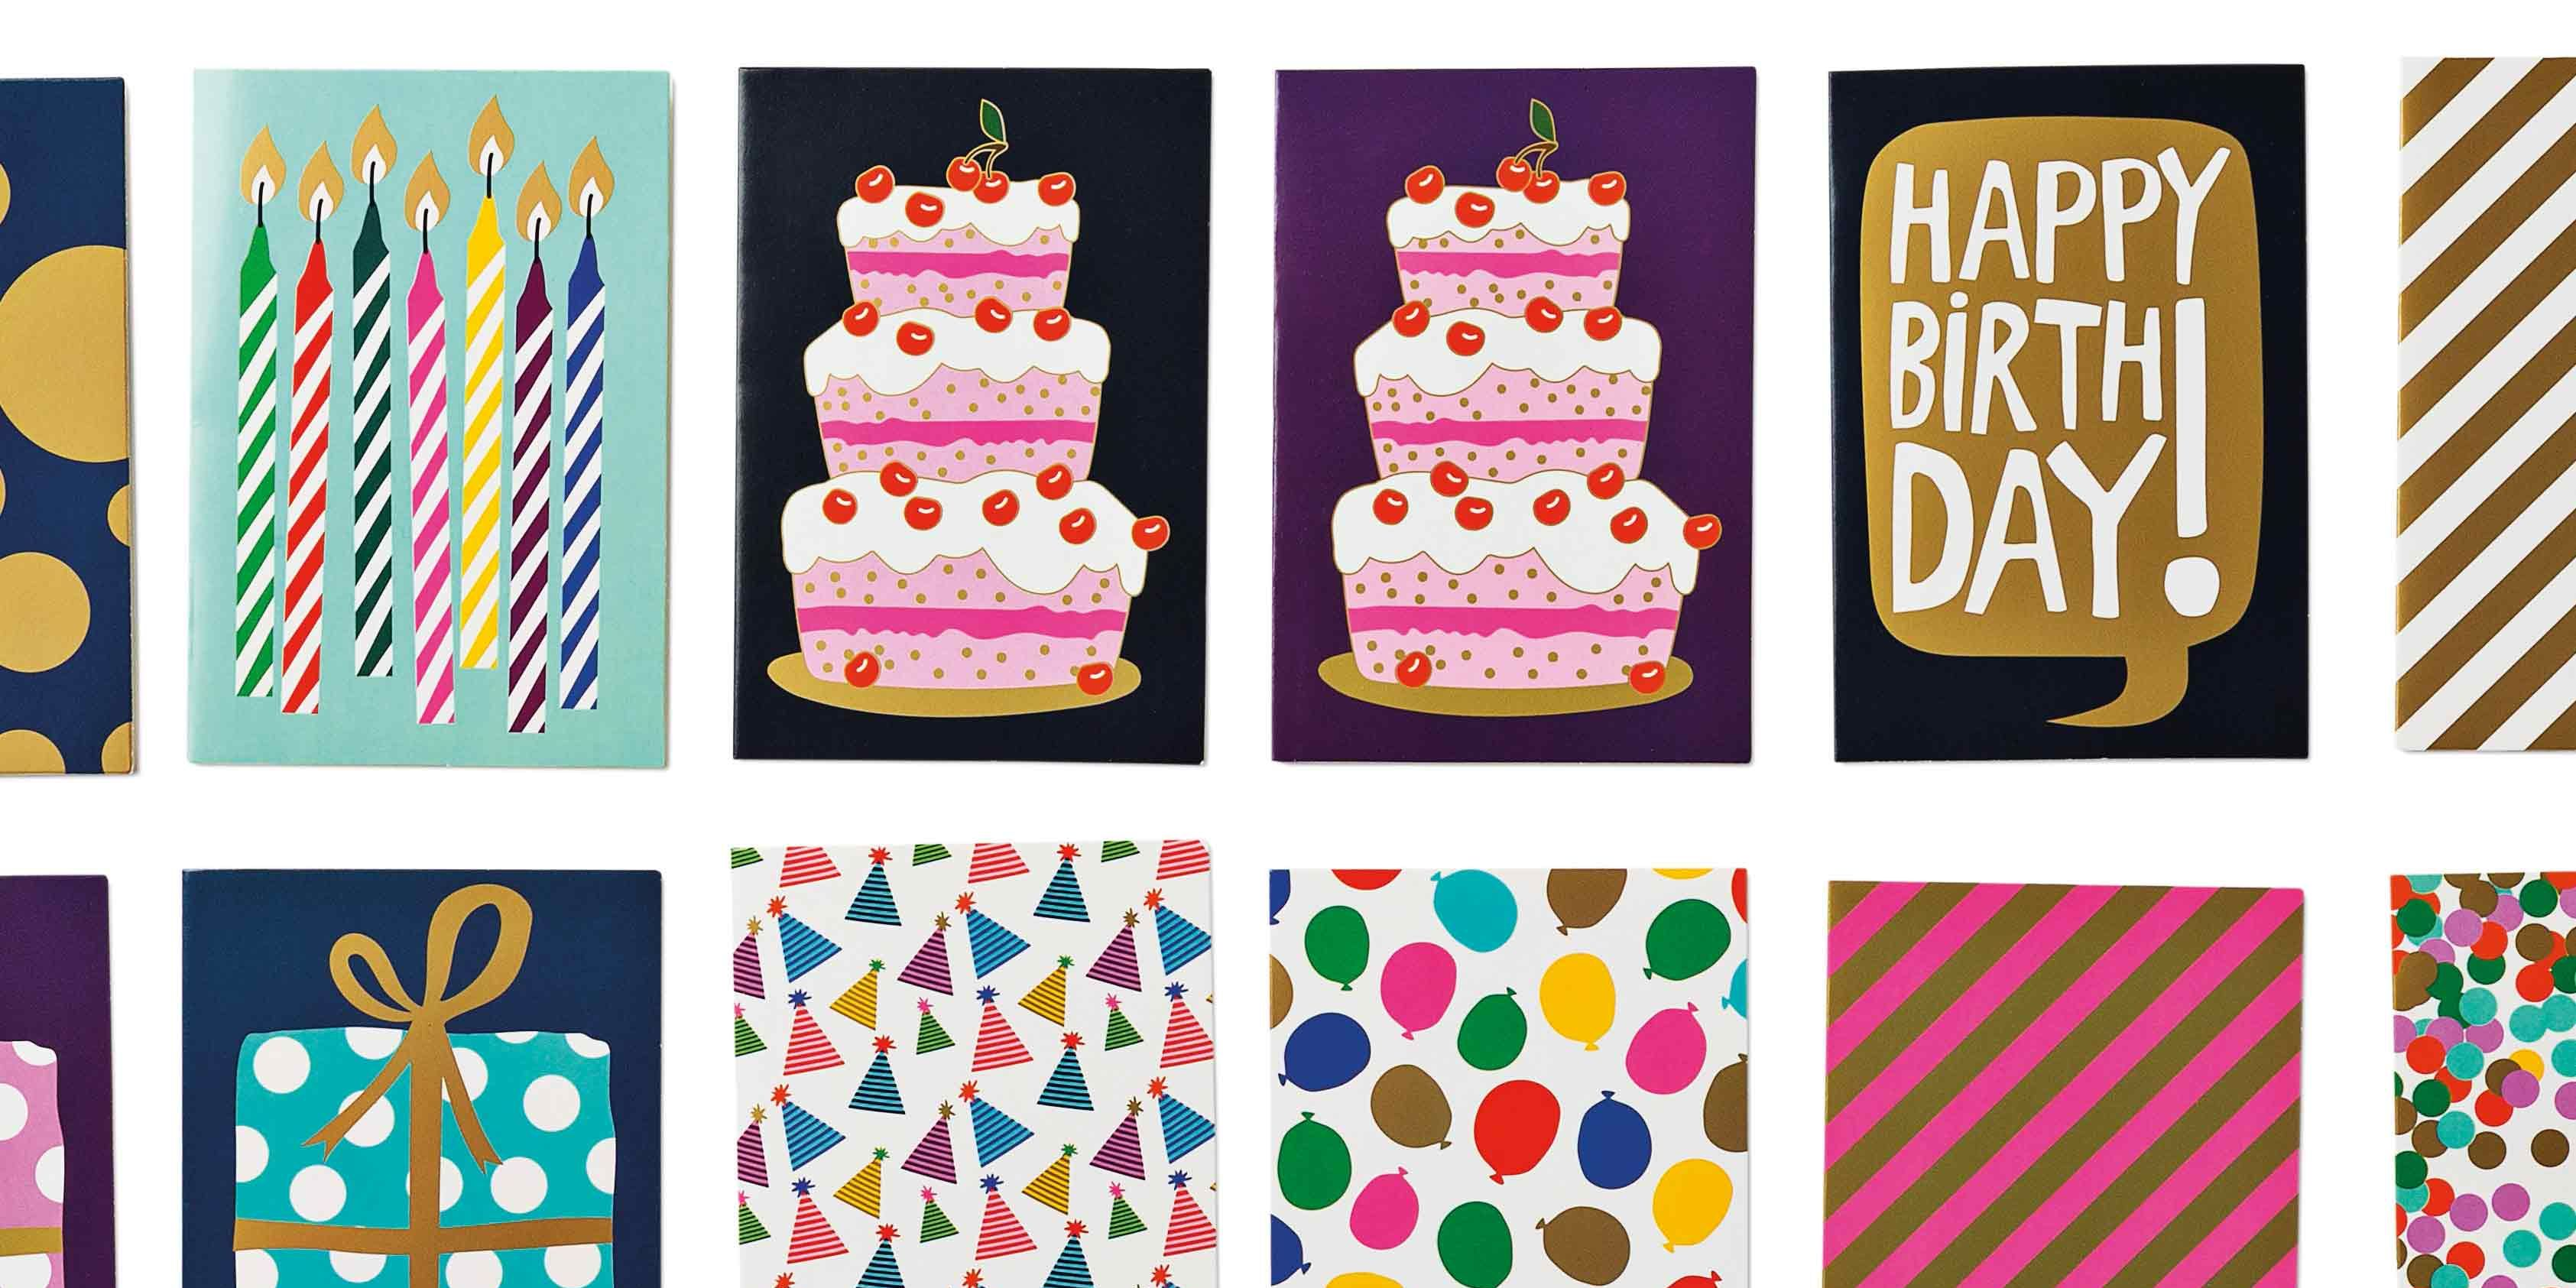 13 detalles decorativos perfectos para una fiesta infantil